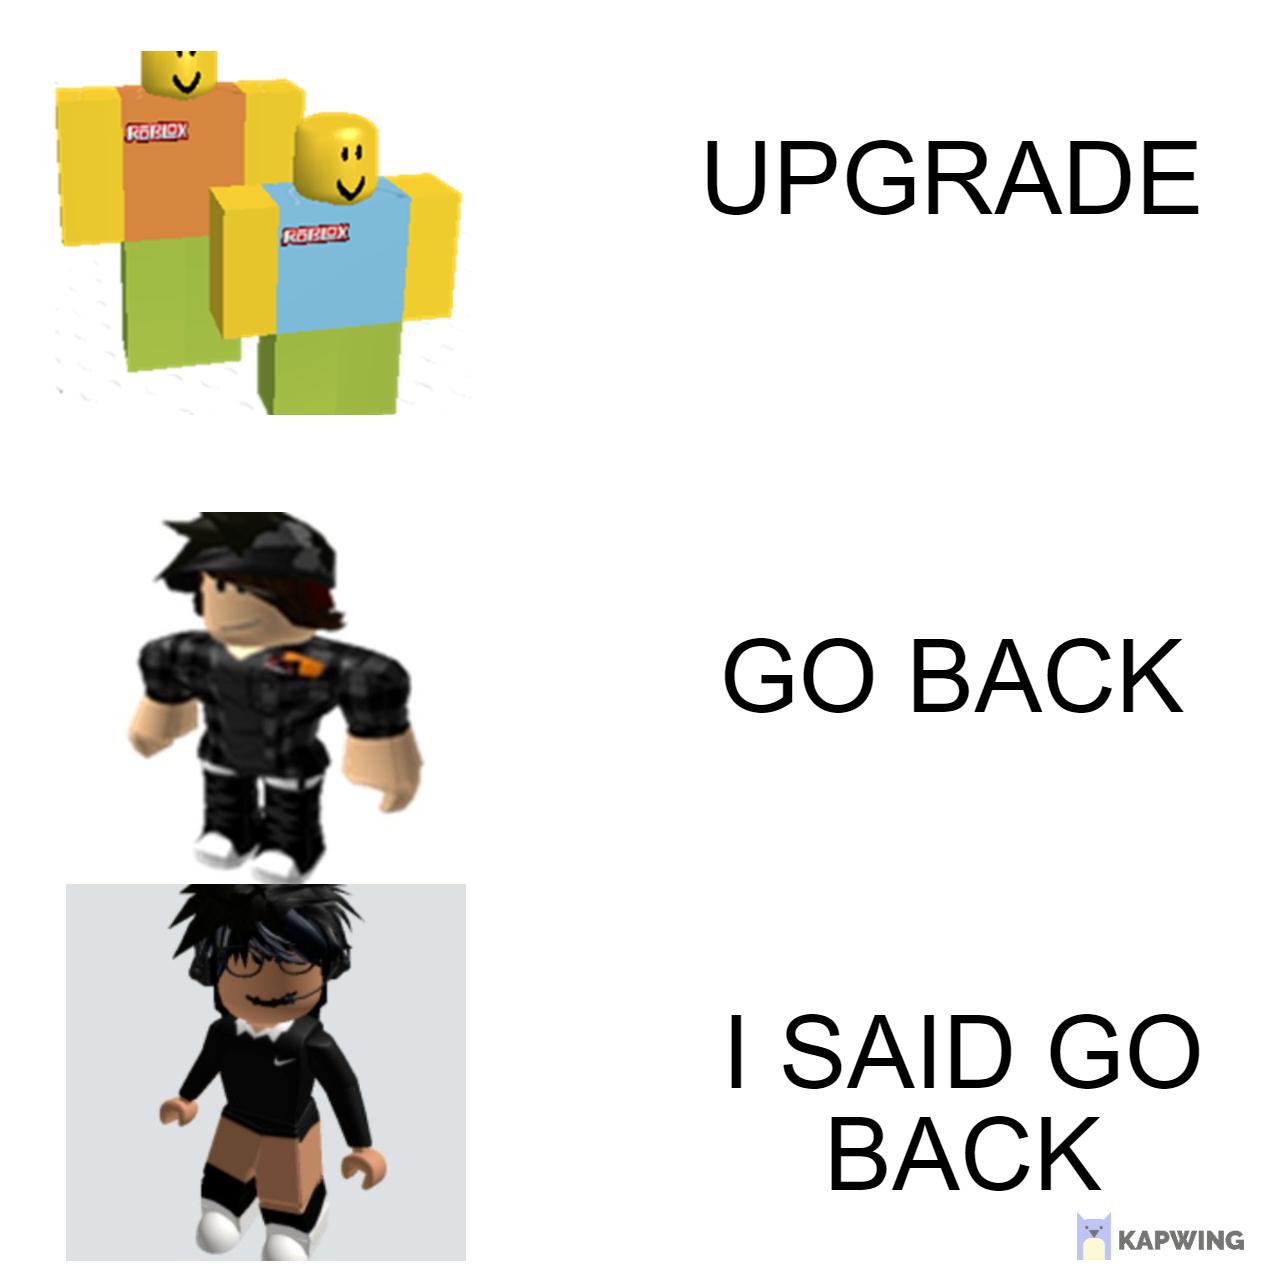 Roblox Upgrade - meme